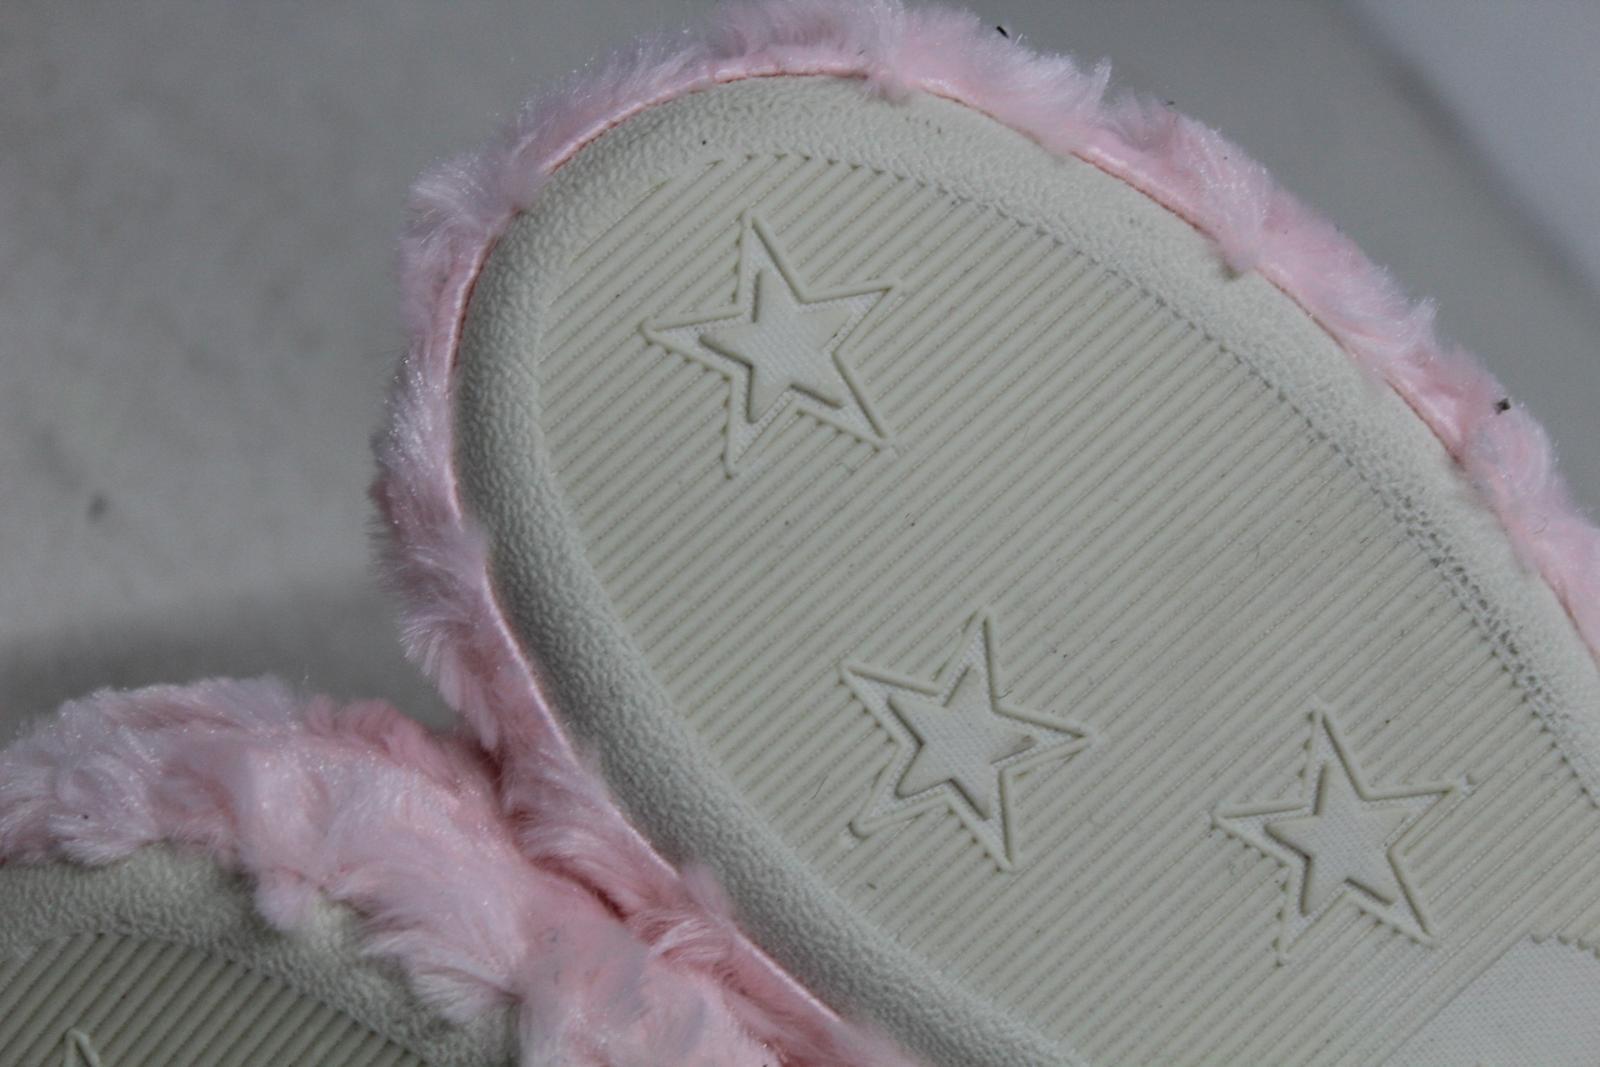 CHIC PRINCESS Girls Pink Fluffy Winter Warm Slipper Shoe Boots UK5 EU38 BNWT 11